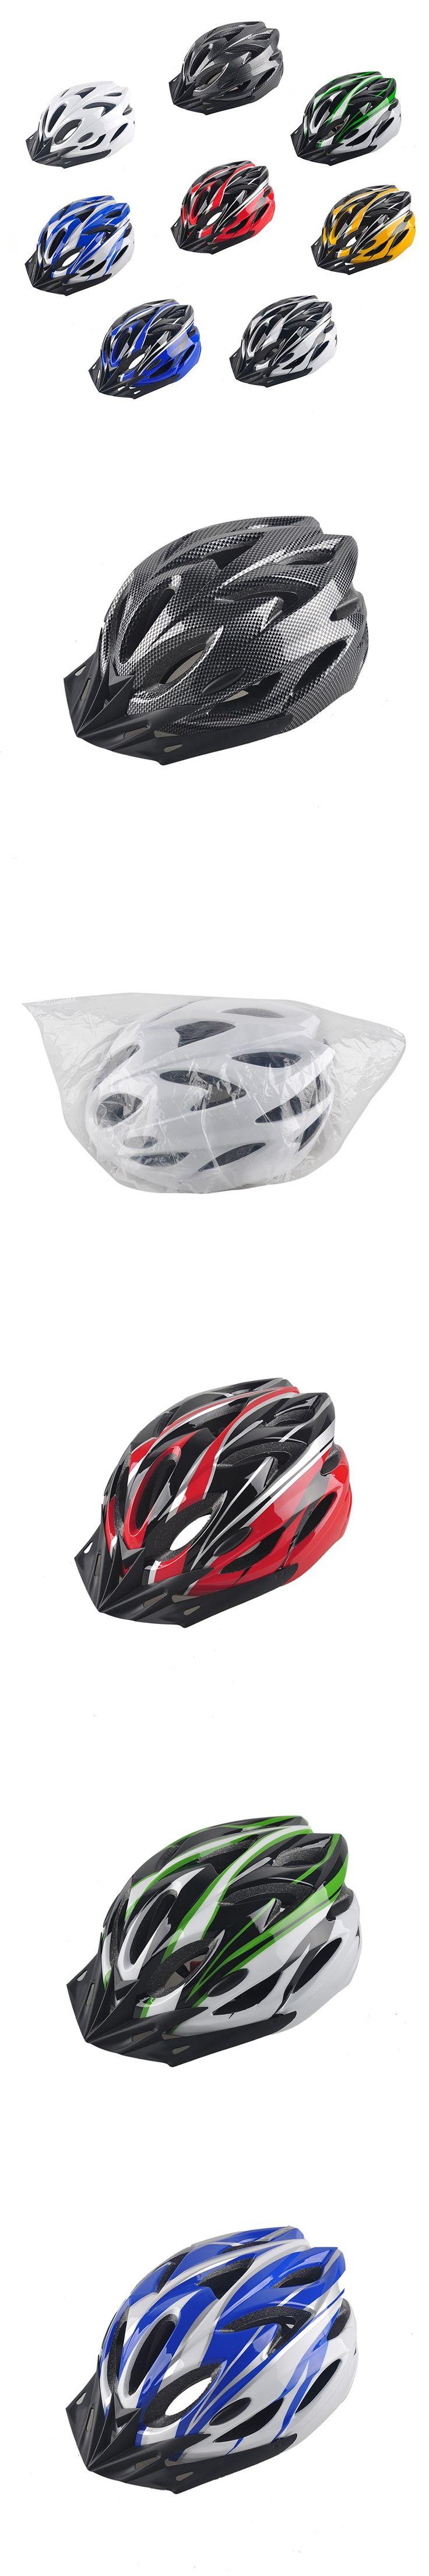 Hot Sale Mountain Bike Helmet Men Women Back Light Road Cycling Integrally Molded Safety In-mold Helmets Ultralight 8 Colors